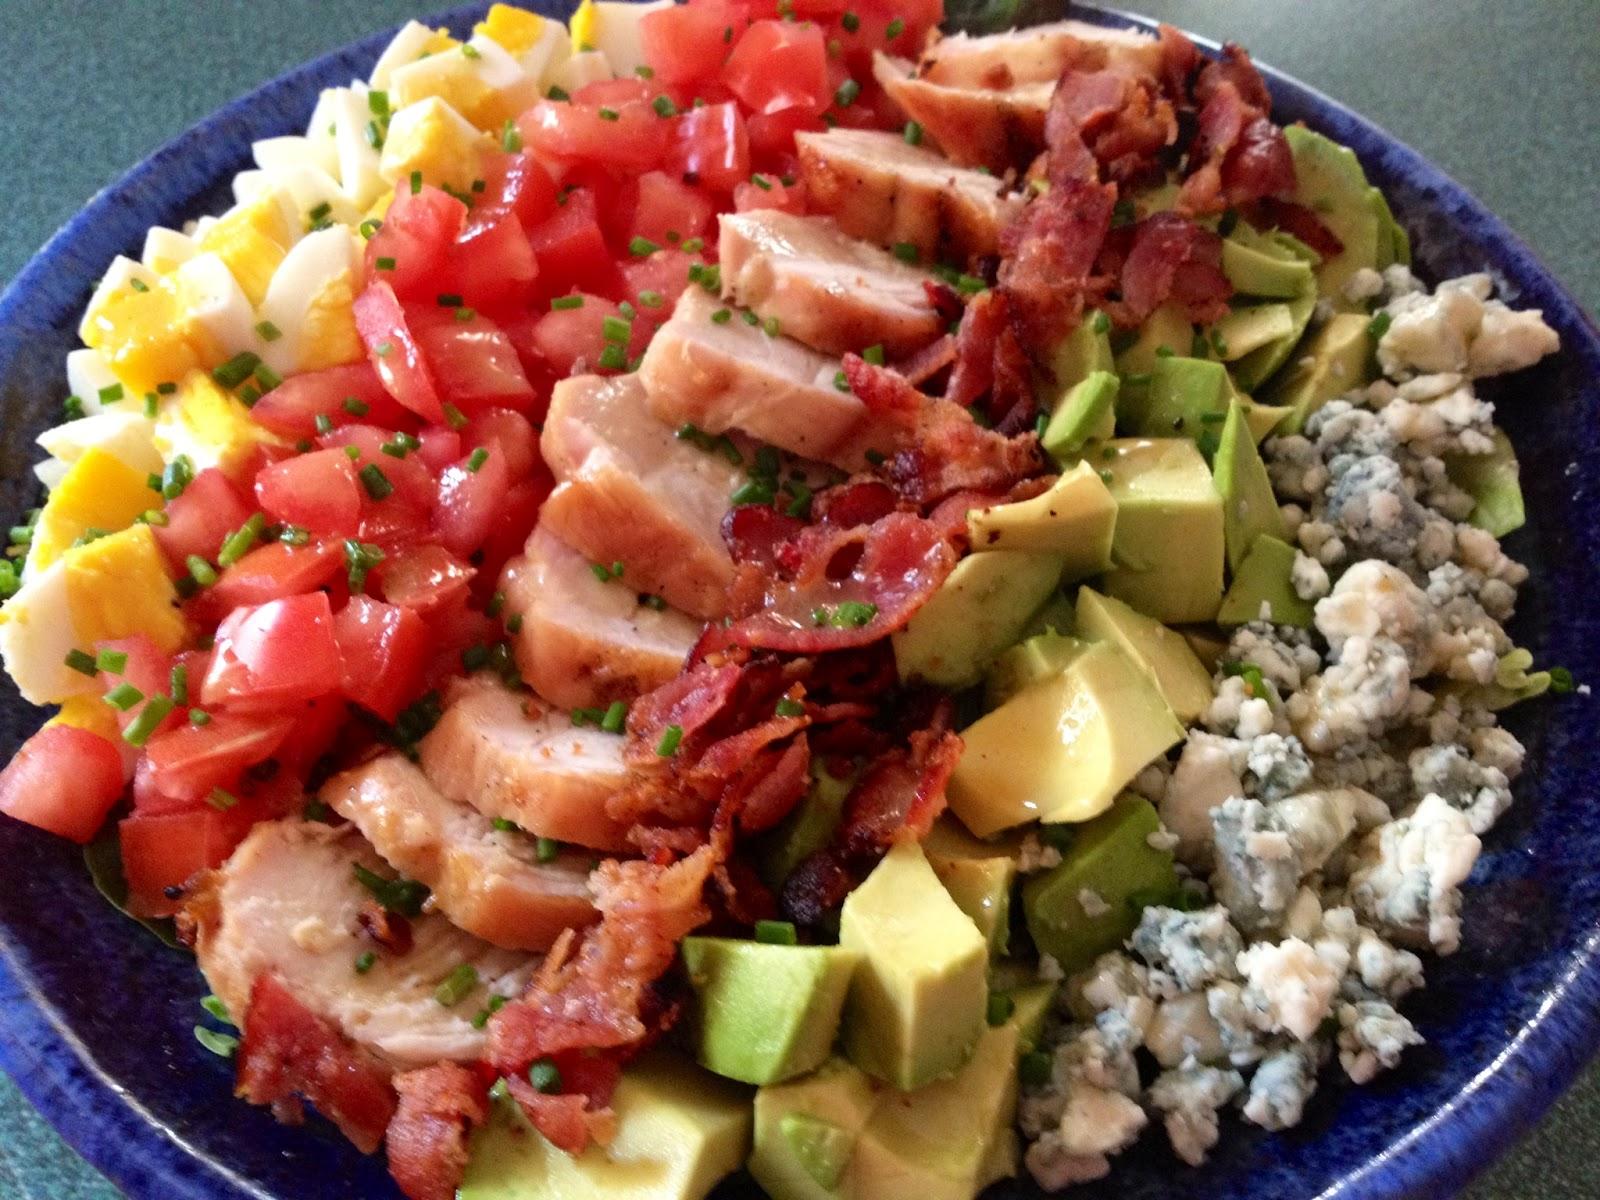 California+Cobb+Salad.JPG